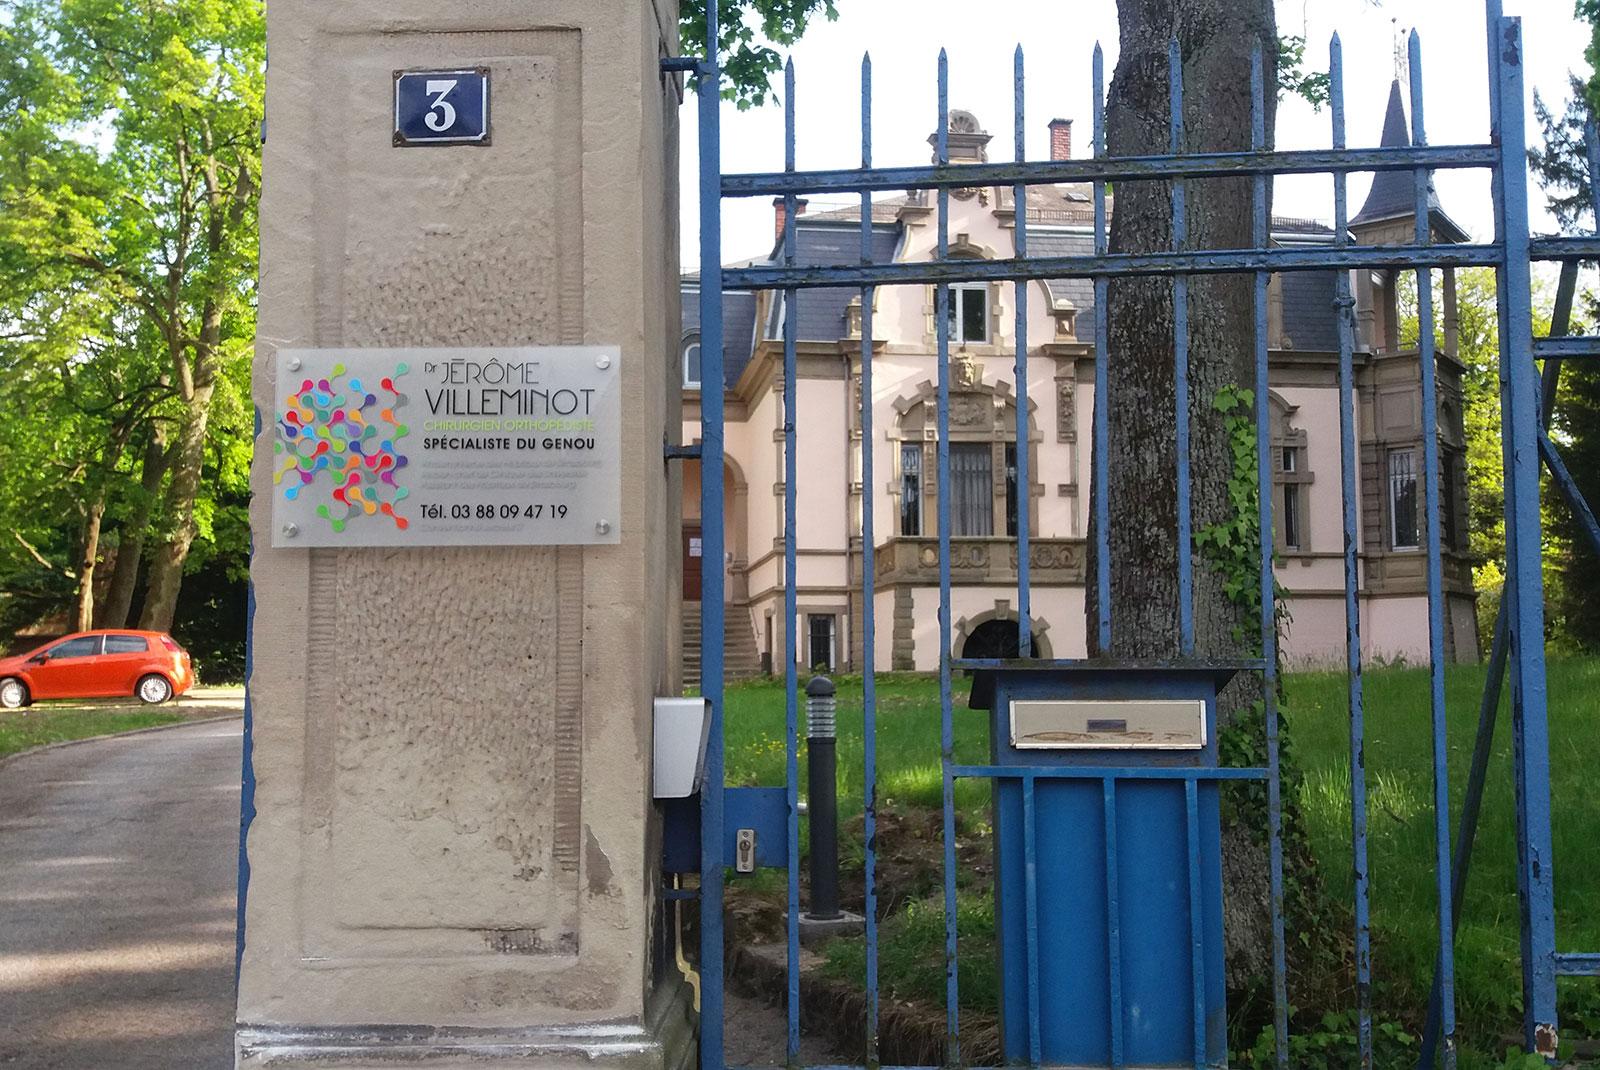 Signalétique Villeminot